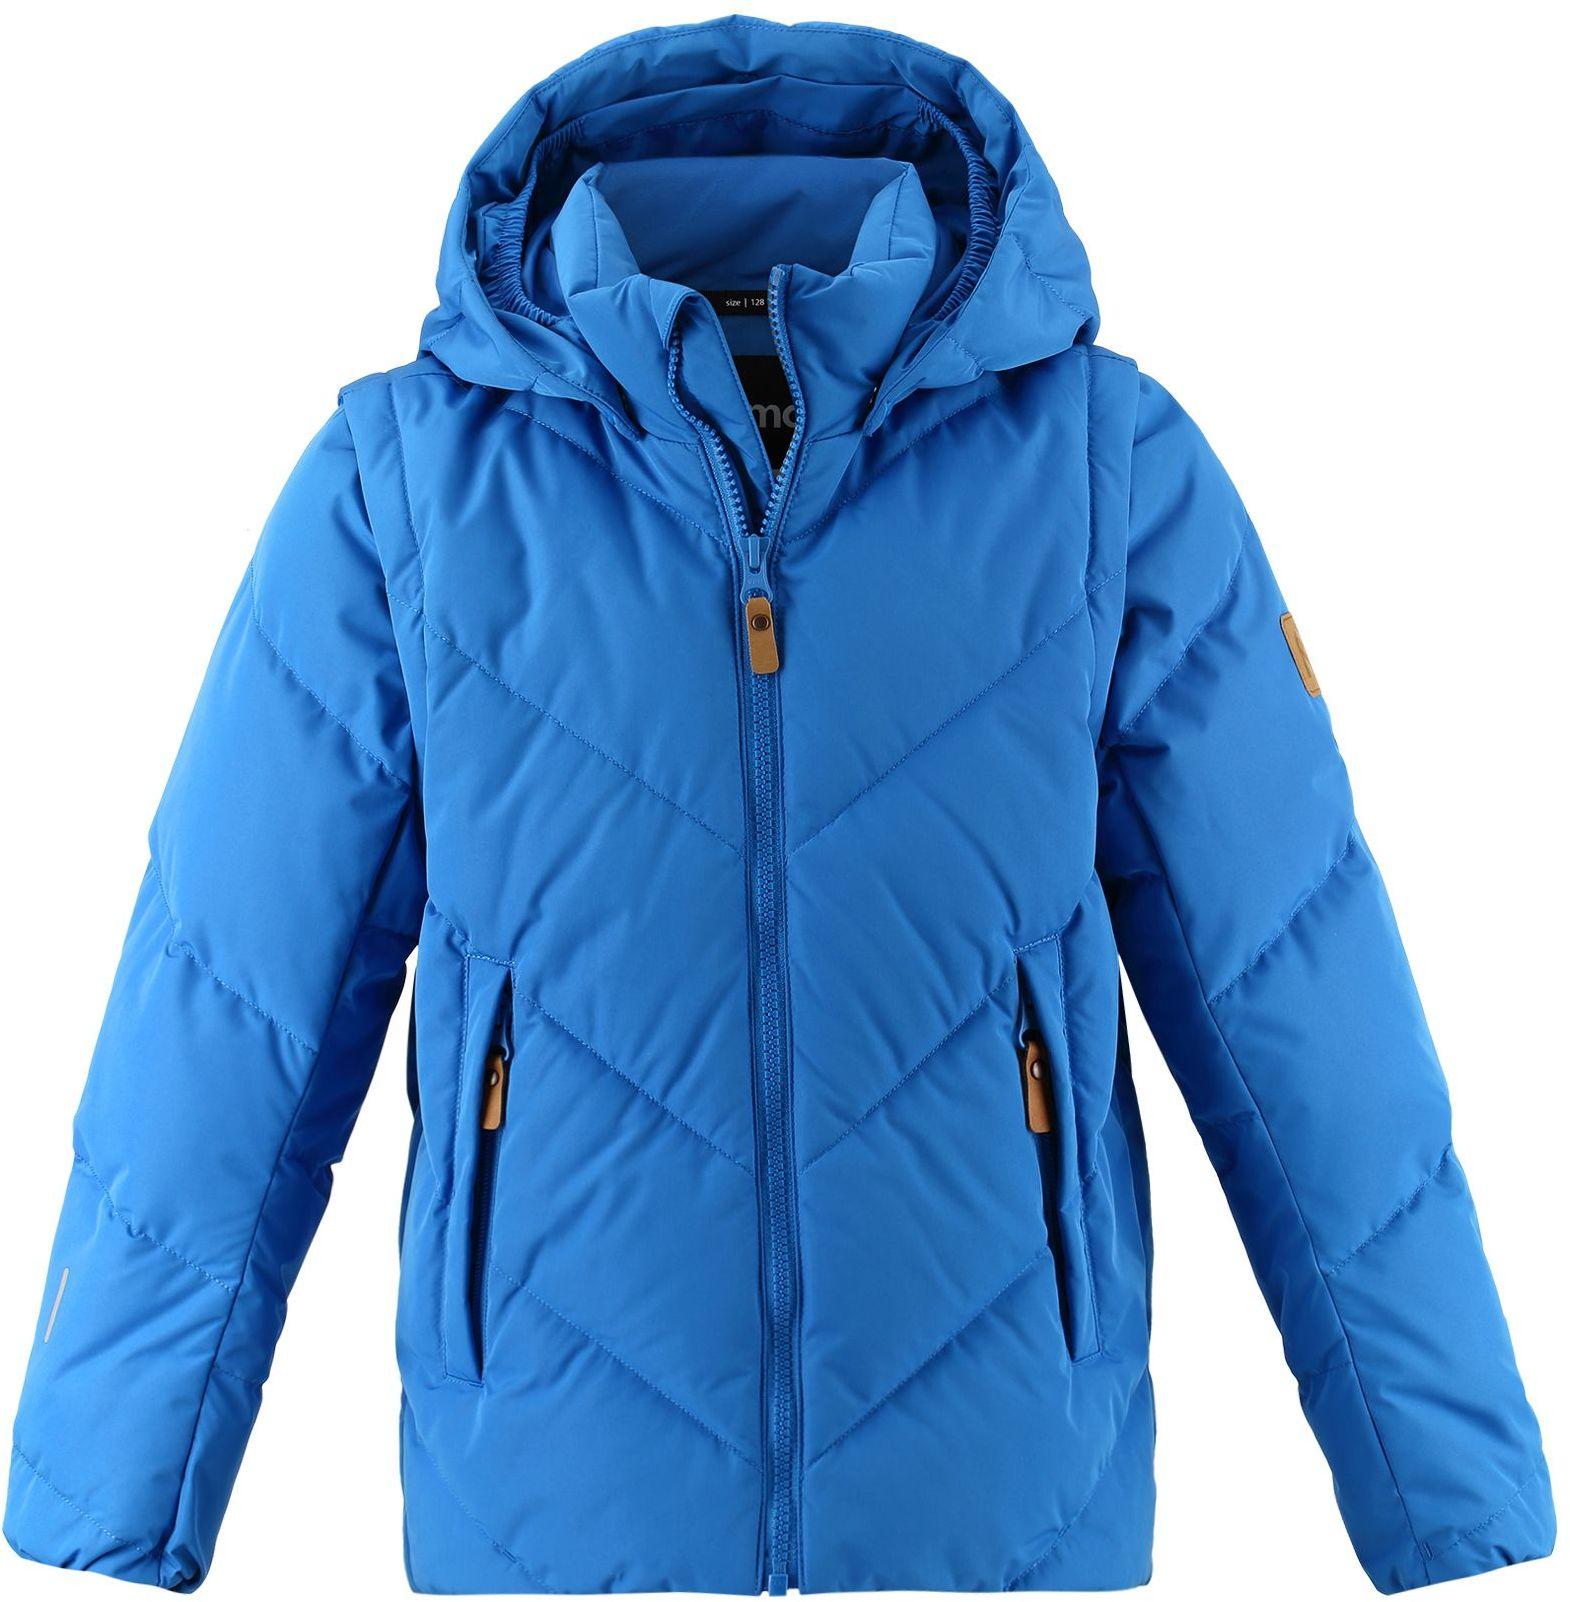 Reima Beringer zimna paperova bunda a vesta pre chlapca